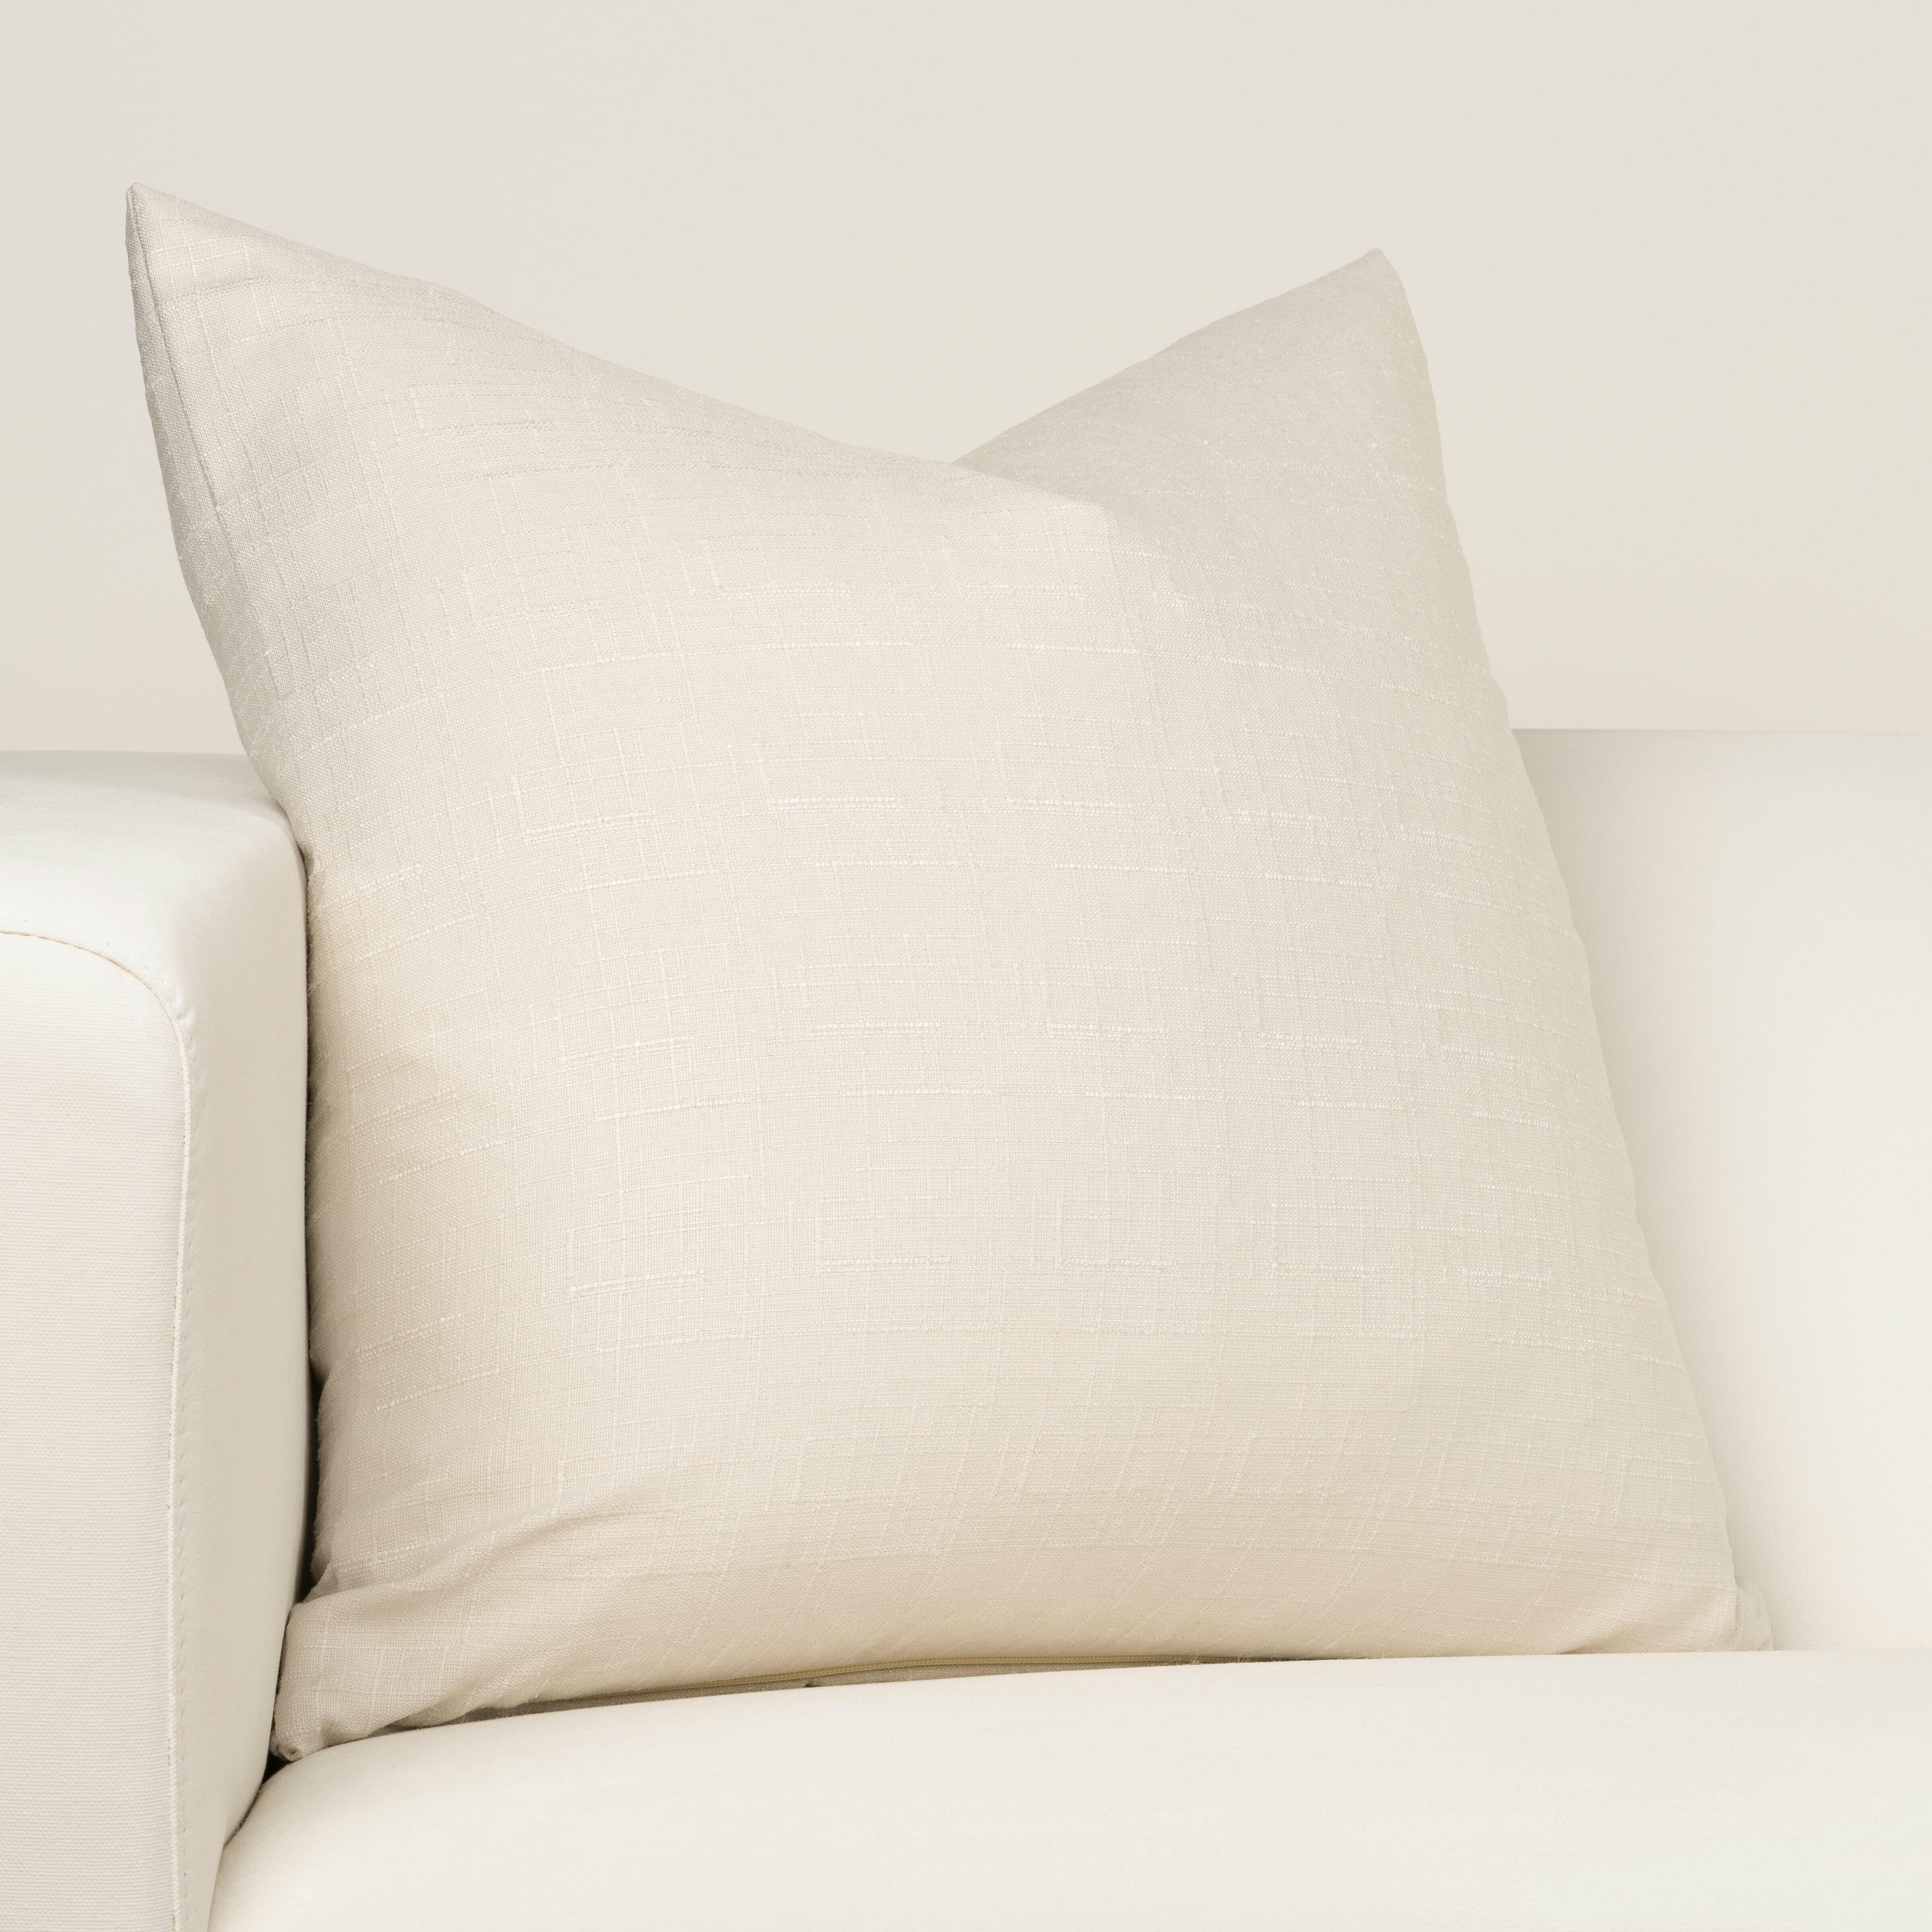 Wayfair Ivory Cream Throw Pillows You Ll Love In 2021